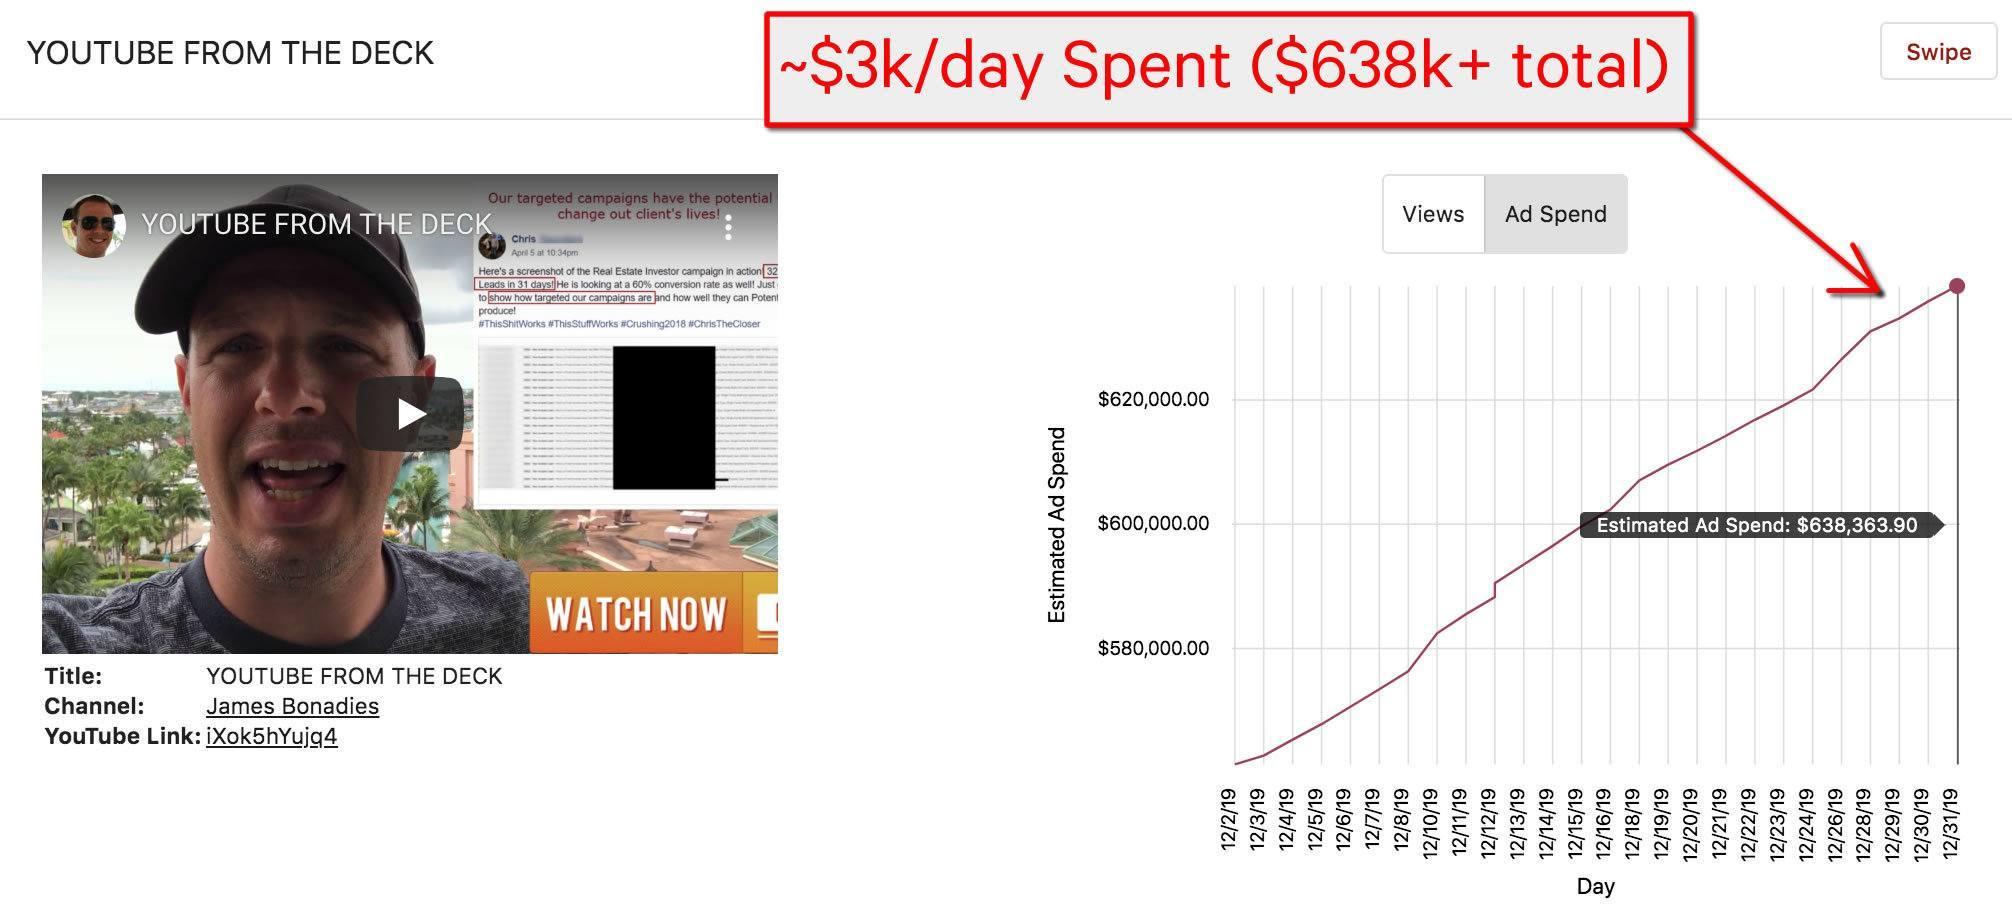 youtube ad spy tool dashboard screenshot for info product